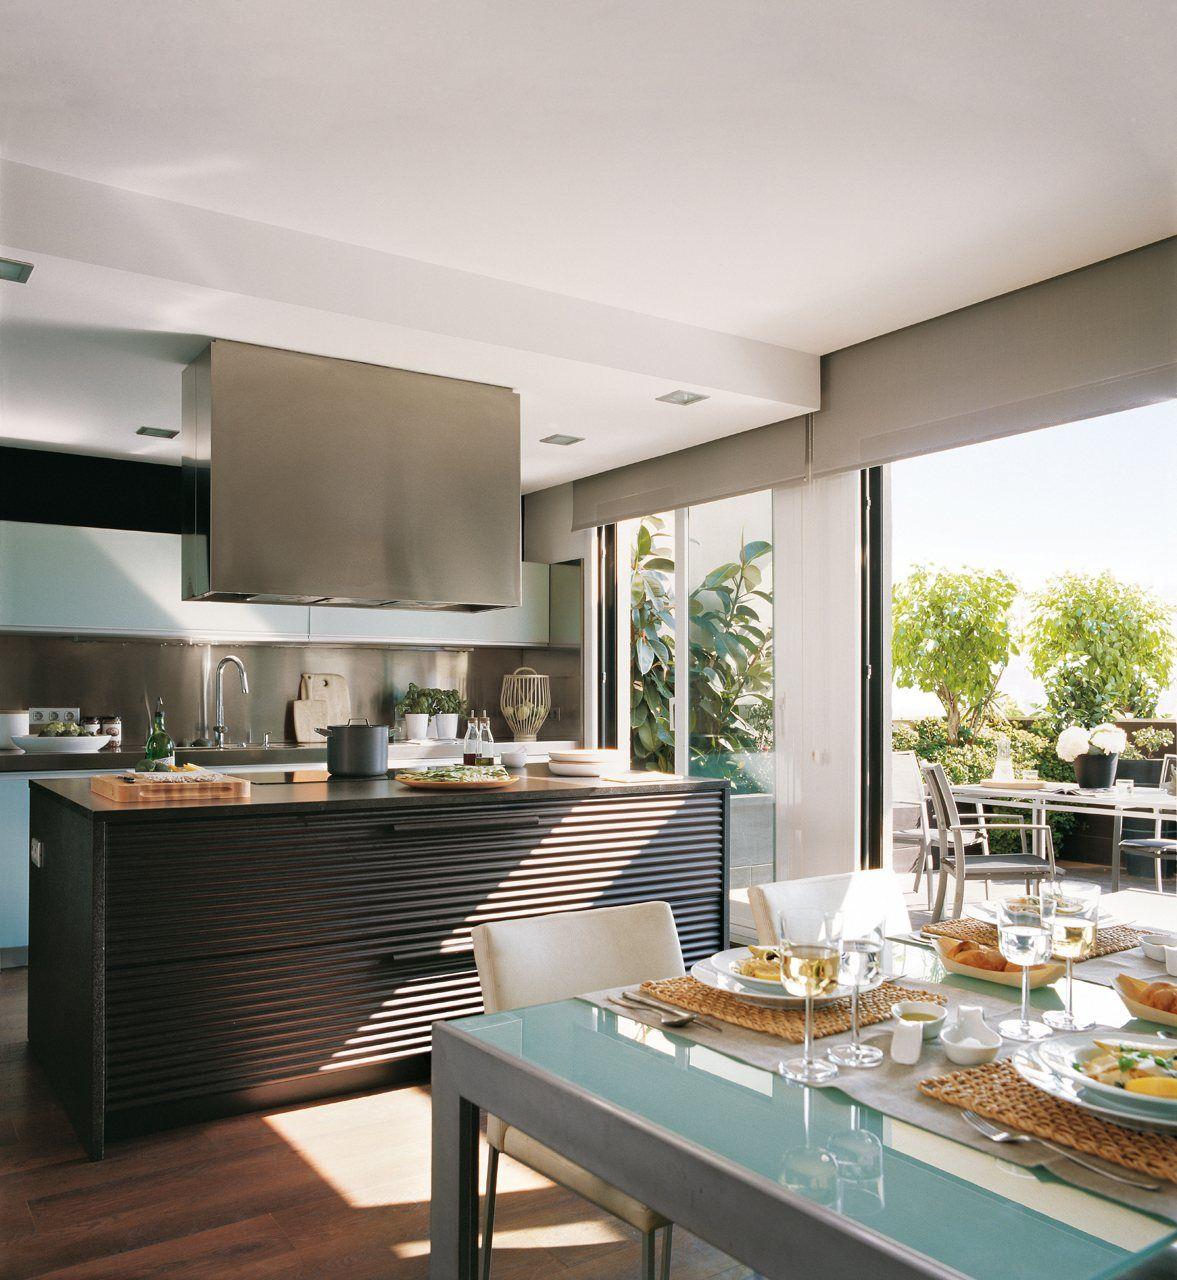 Renovar la cocina sin obras pinterest kitchen decor kitchens and house - Renovar cocinas sin obras ...